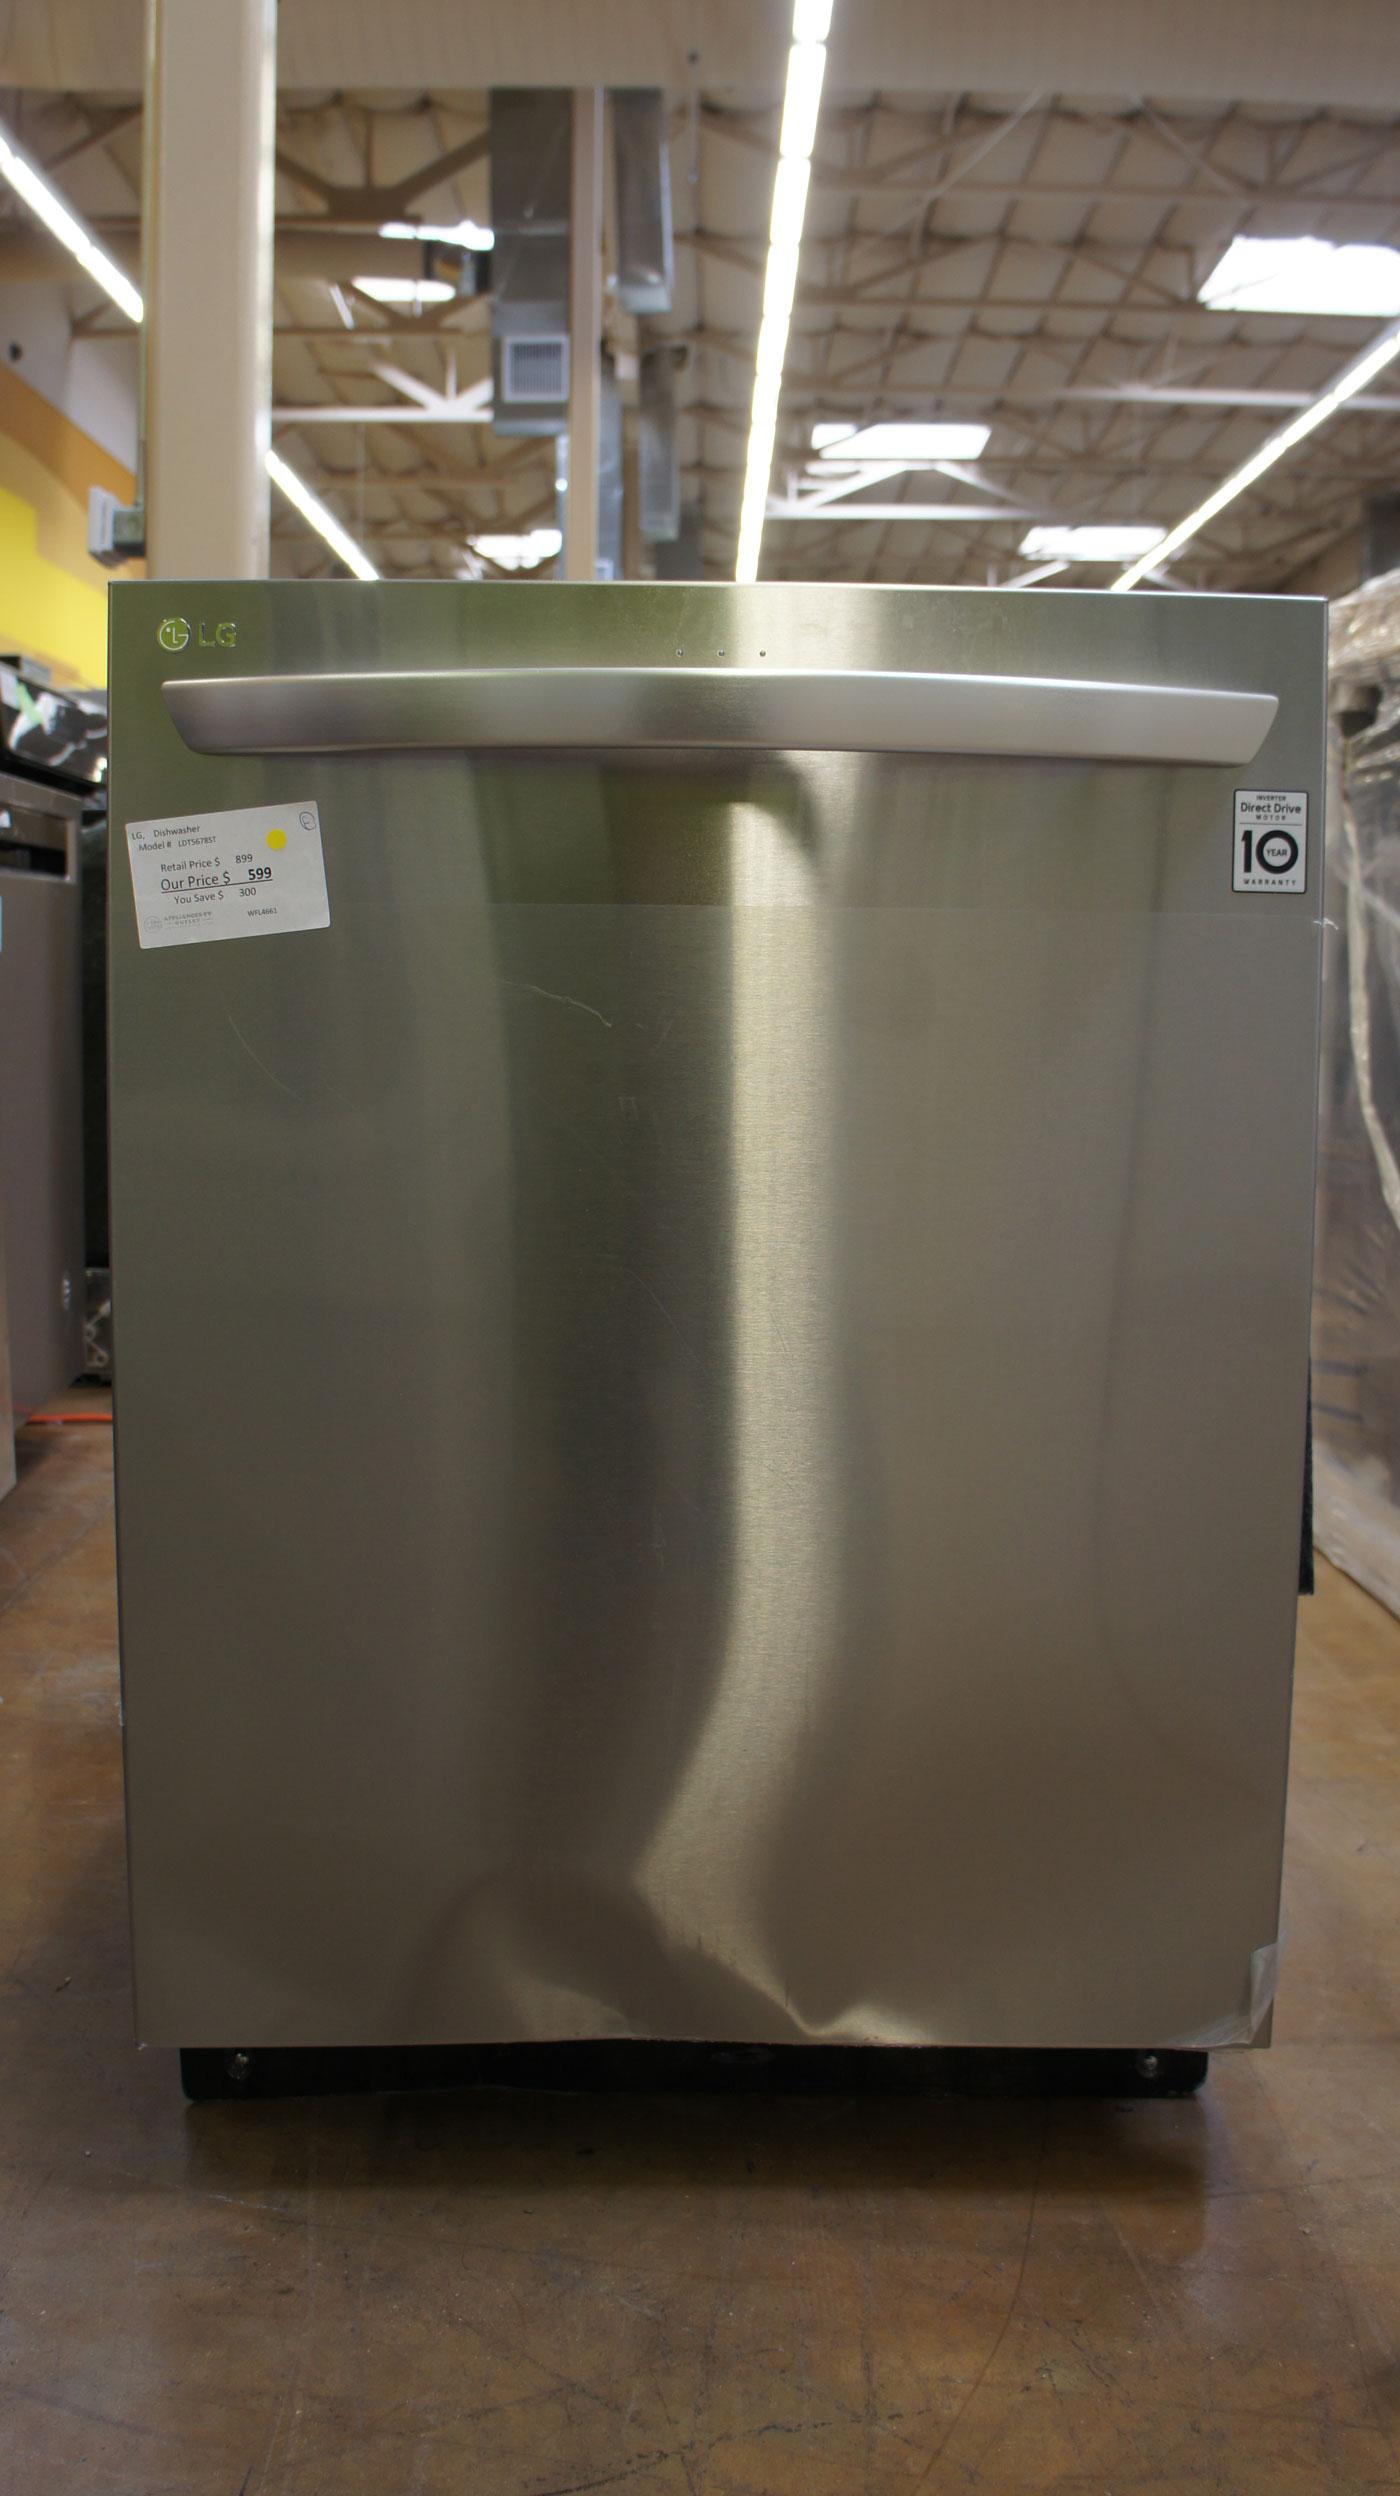 "24"" LG LDT5678SS Fully Integrated QuadWash Dishwasher"